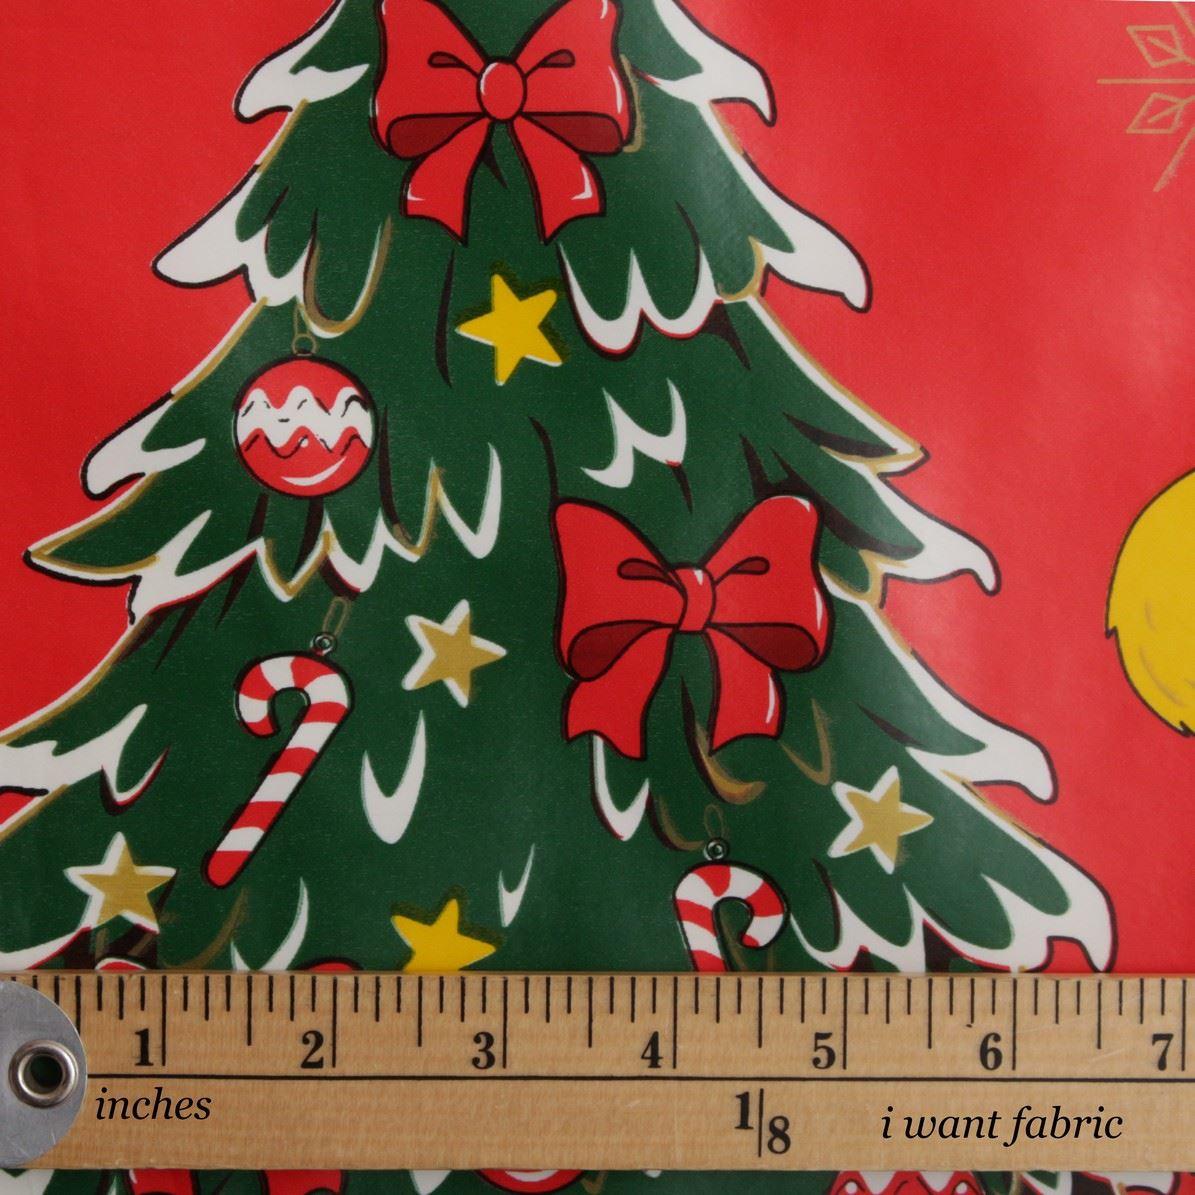 Christmas Pvc Oilcloth Vinyl Fabric Xmas Kitchen Table